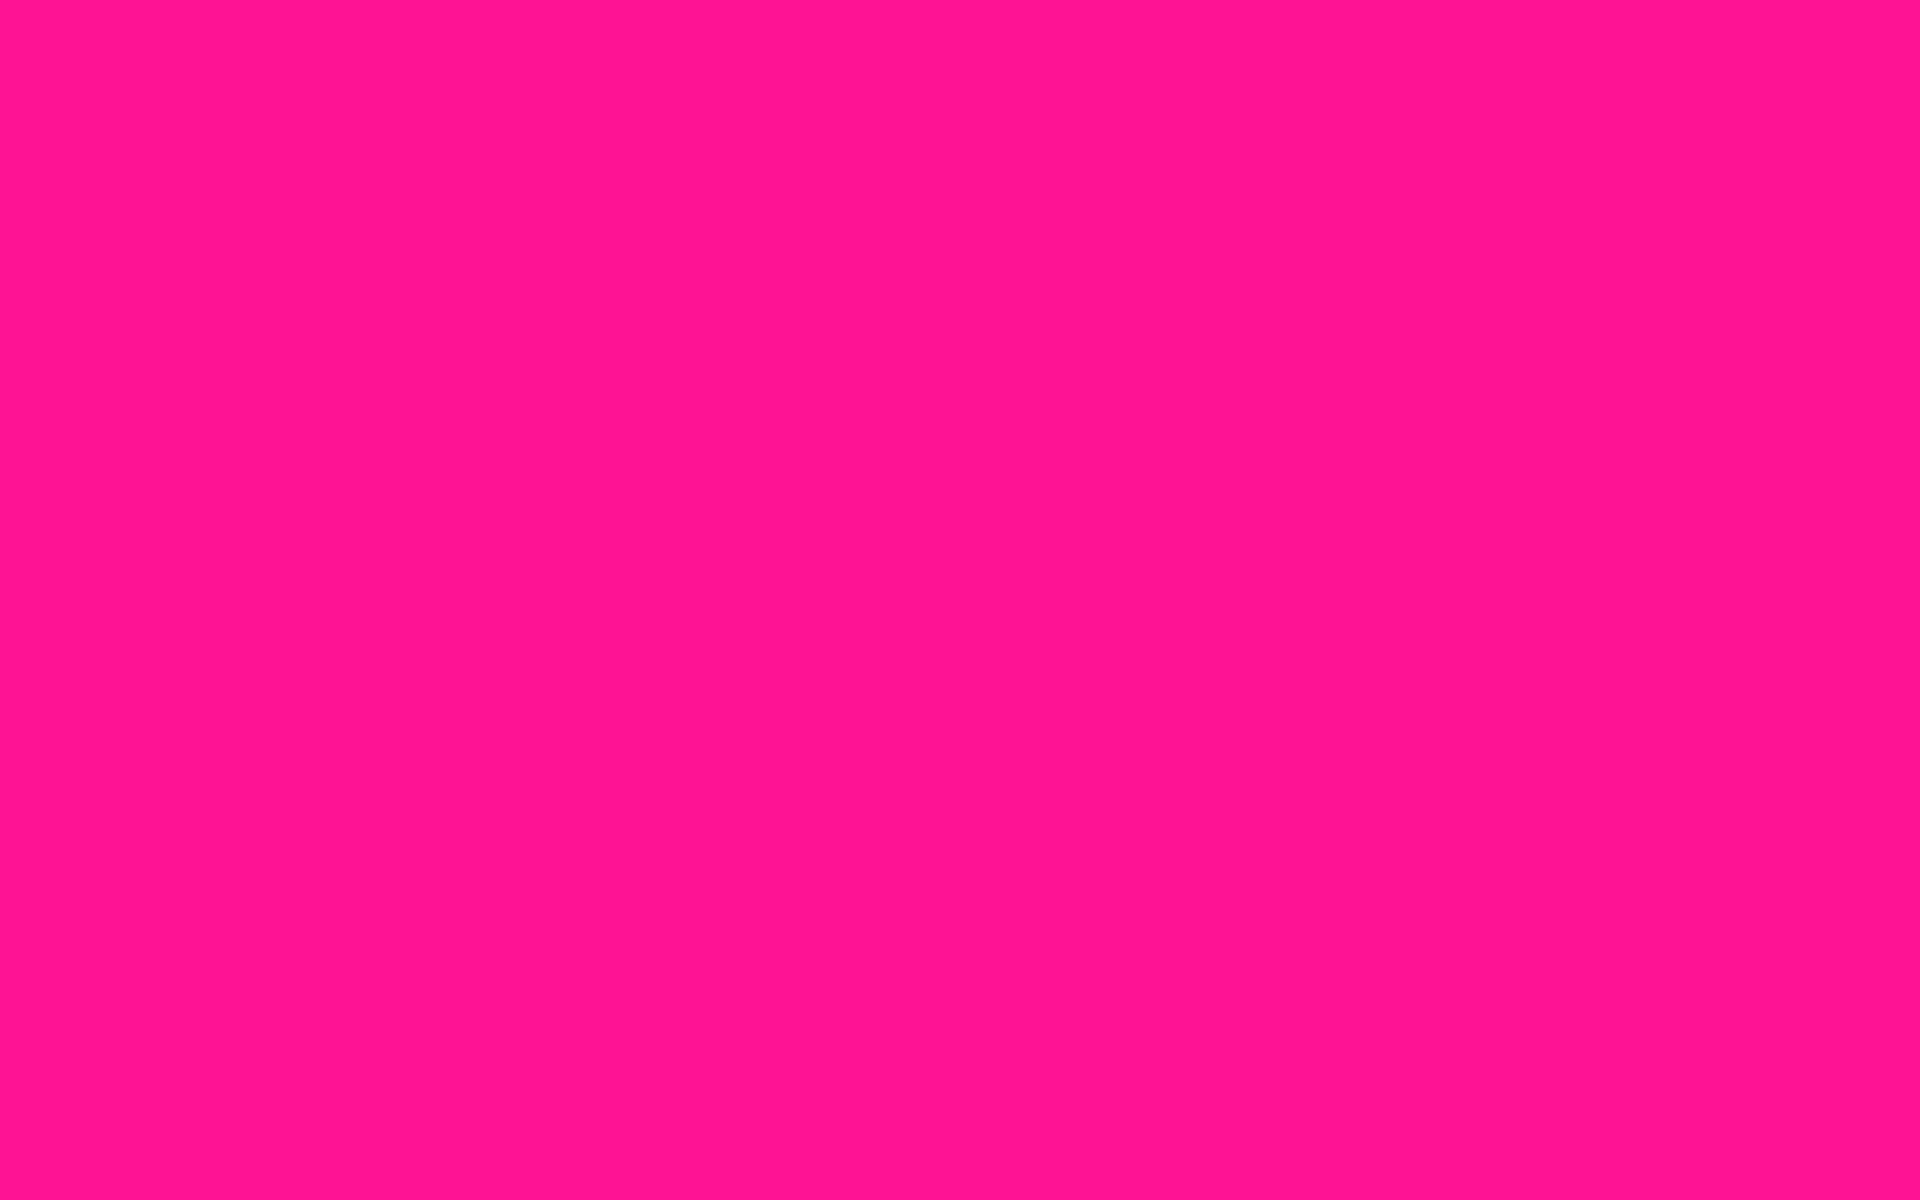 Plain Neon Pink Background